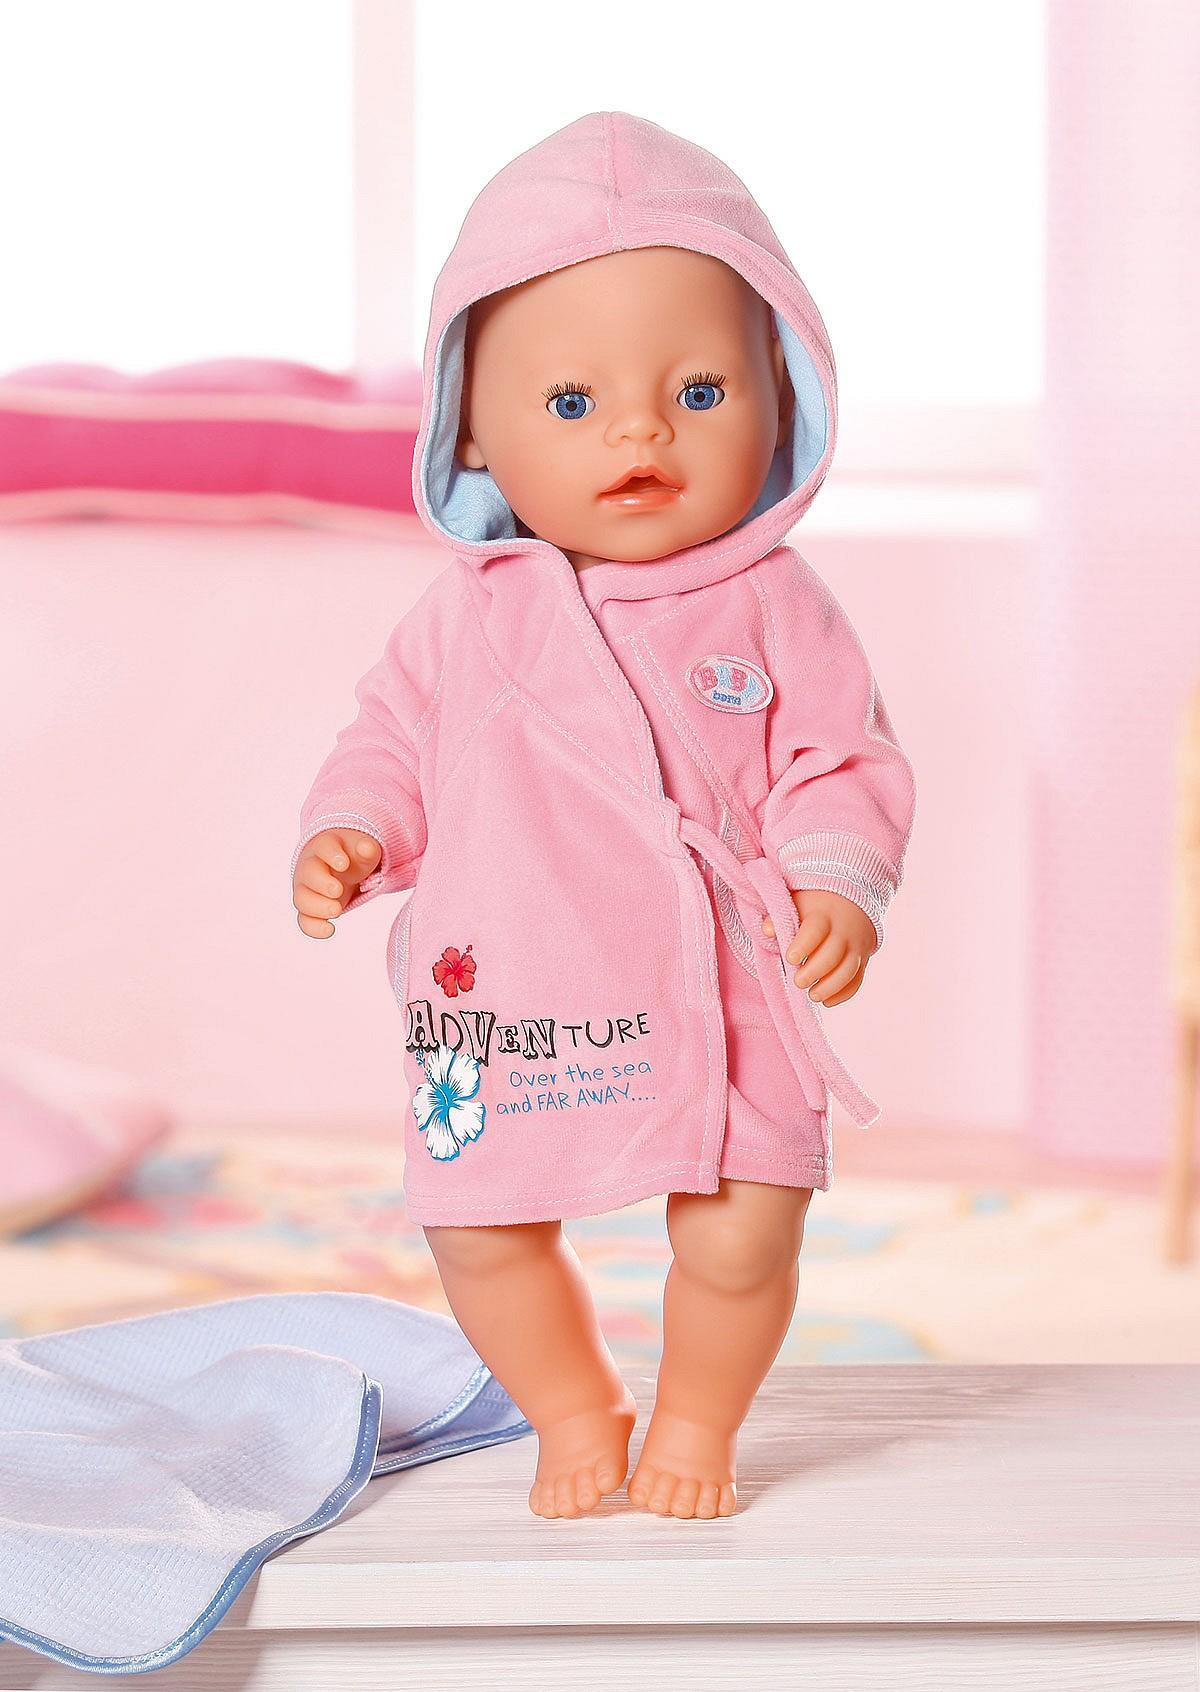 44f86e6bf Baby Born - BB kylpytakki